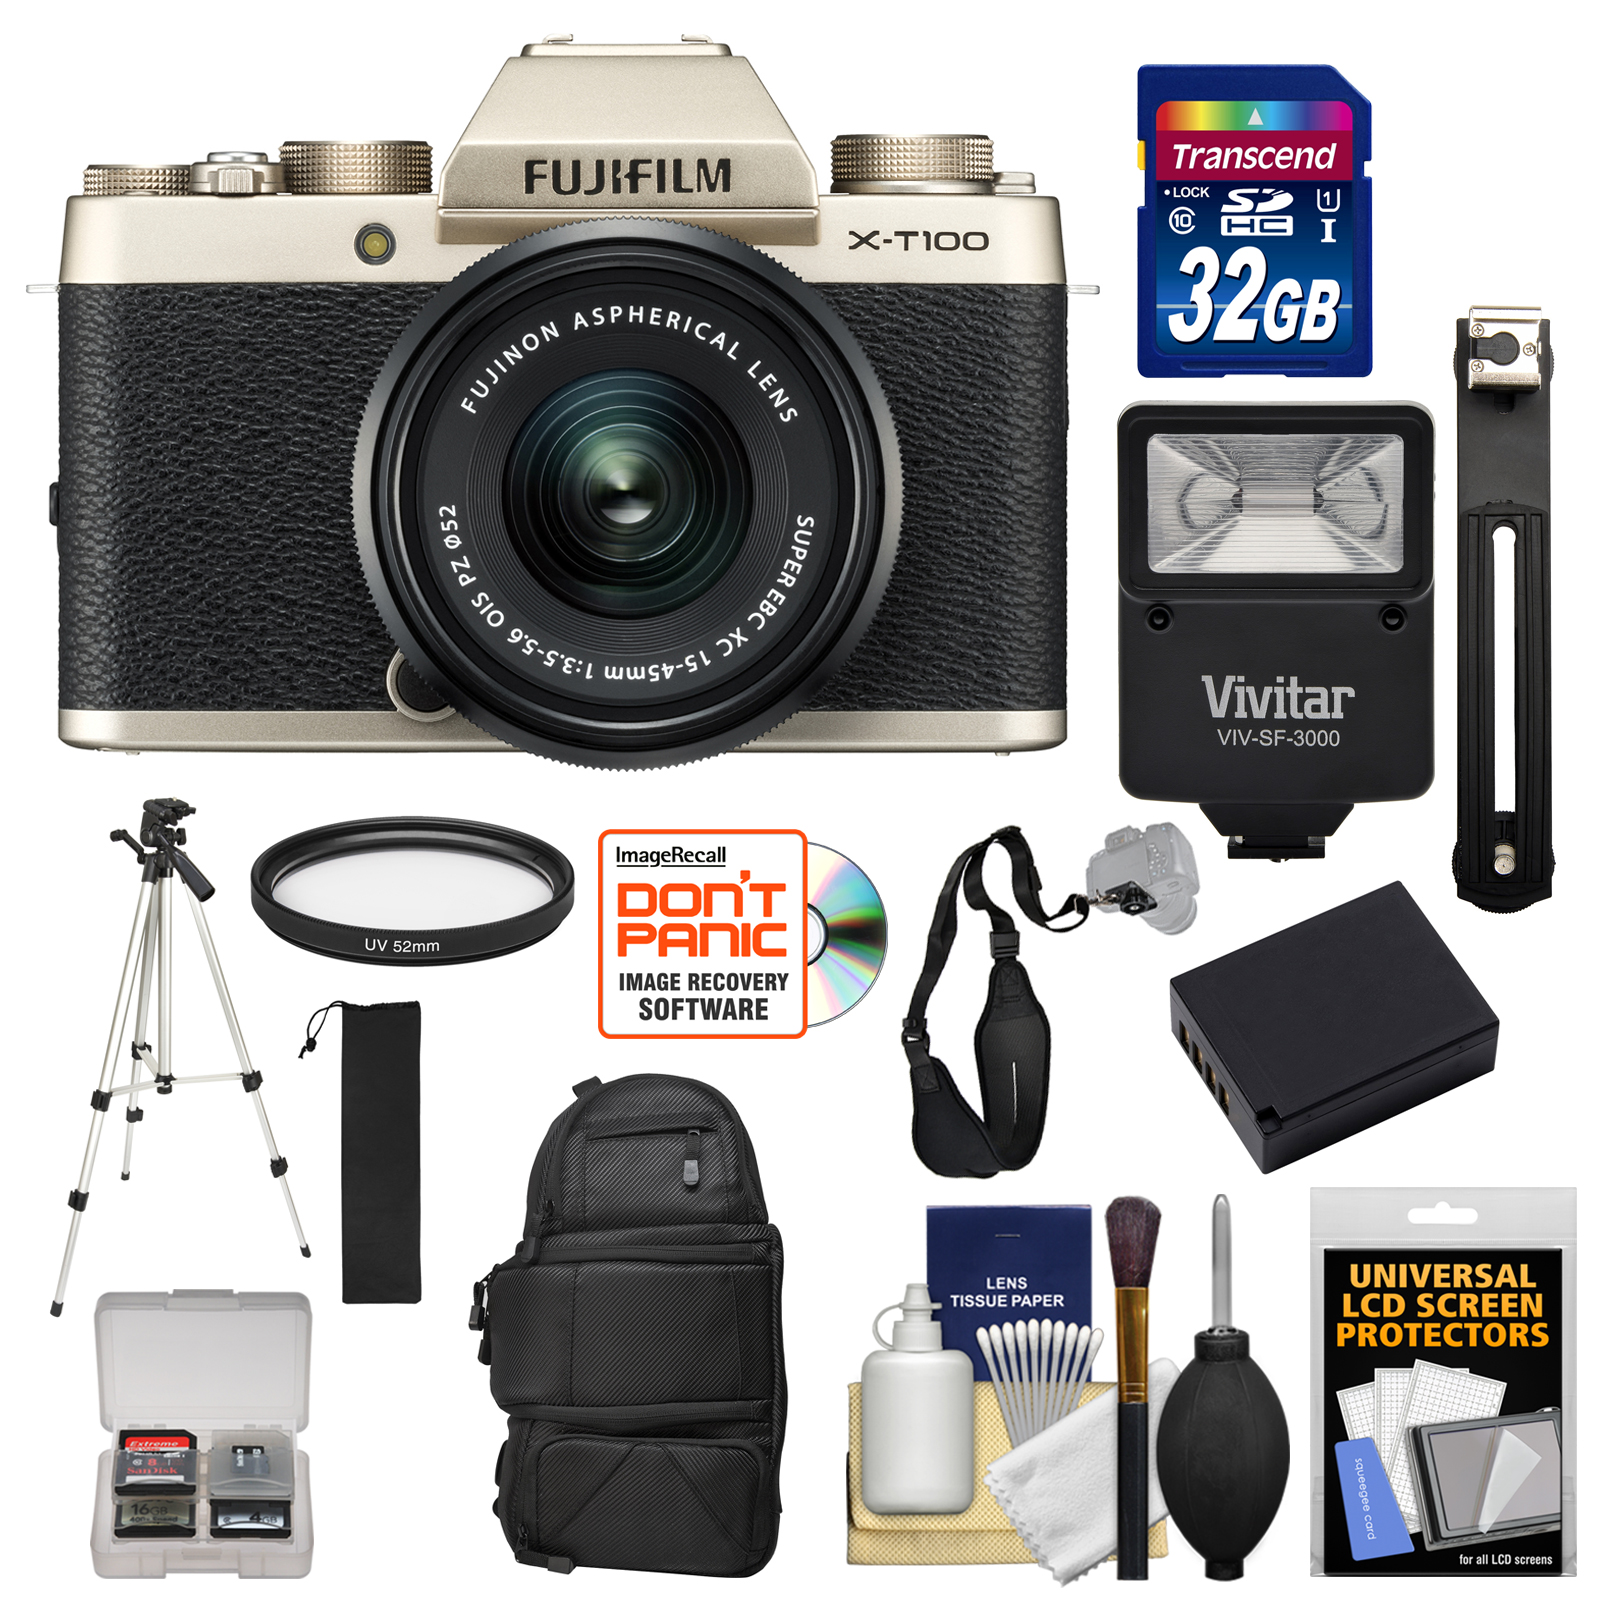 Fujifilm X-T100 Digital Camera & 15-45mm XC OIS PZ Lens (Champagne Gold) with 32GB Card + Backpack + Battery + Tripod + Kit